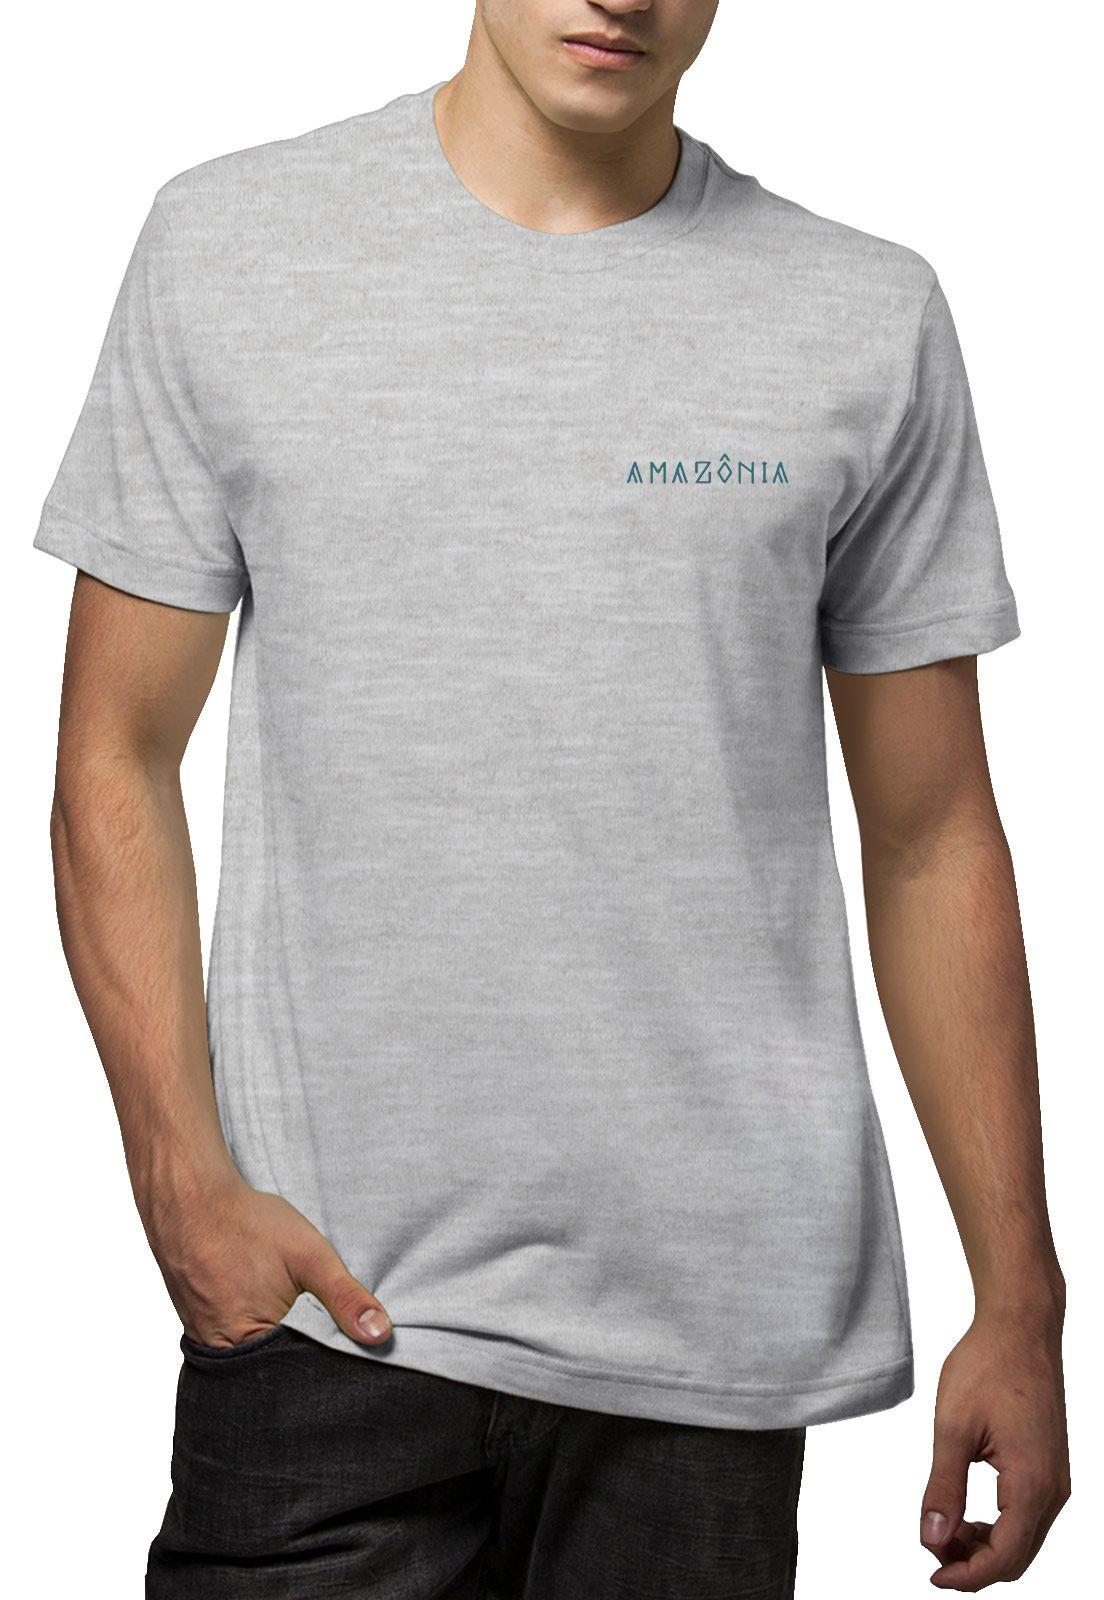 Camiseta Amazônia Tartaruga Grafismo - Mescla